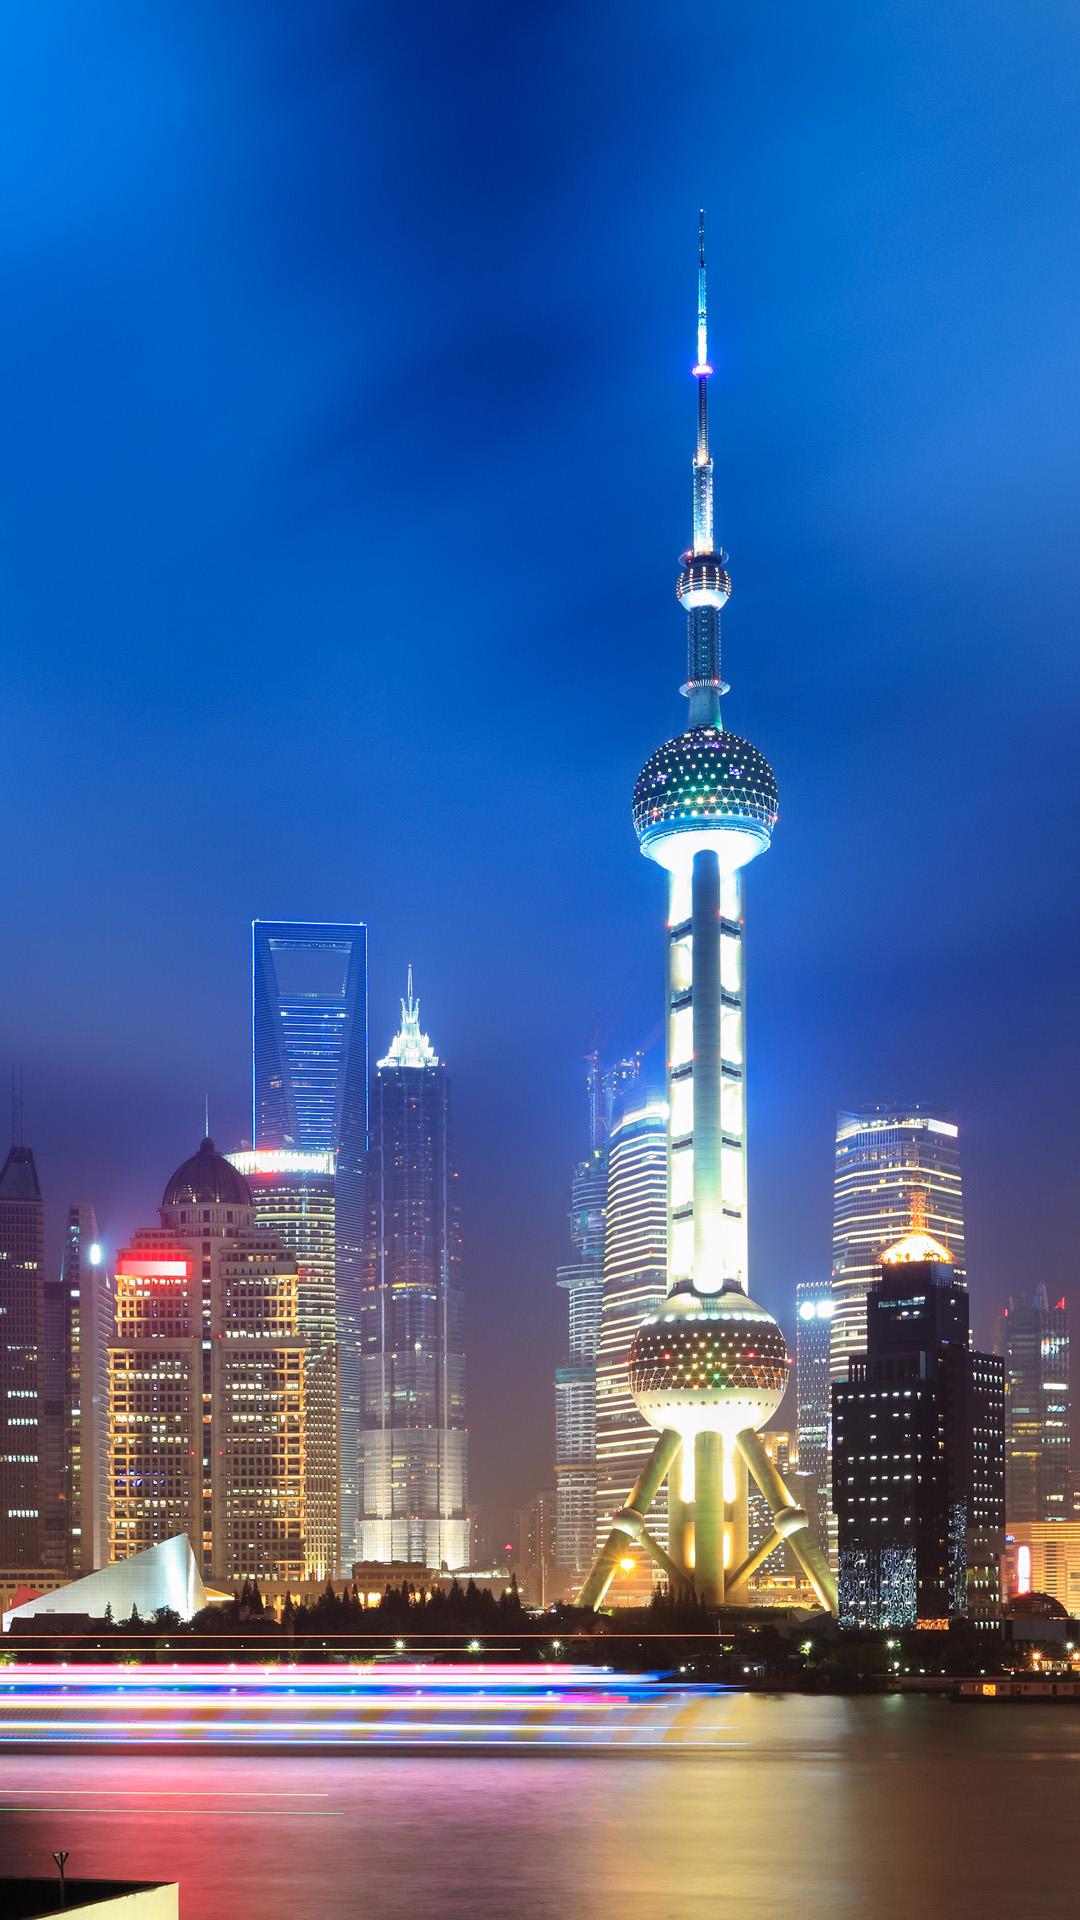 Beautiful city at night iphone 6 plus wallpaper 1080x1920